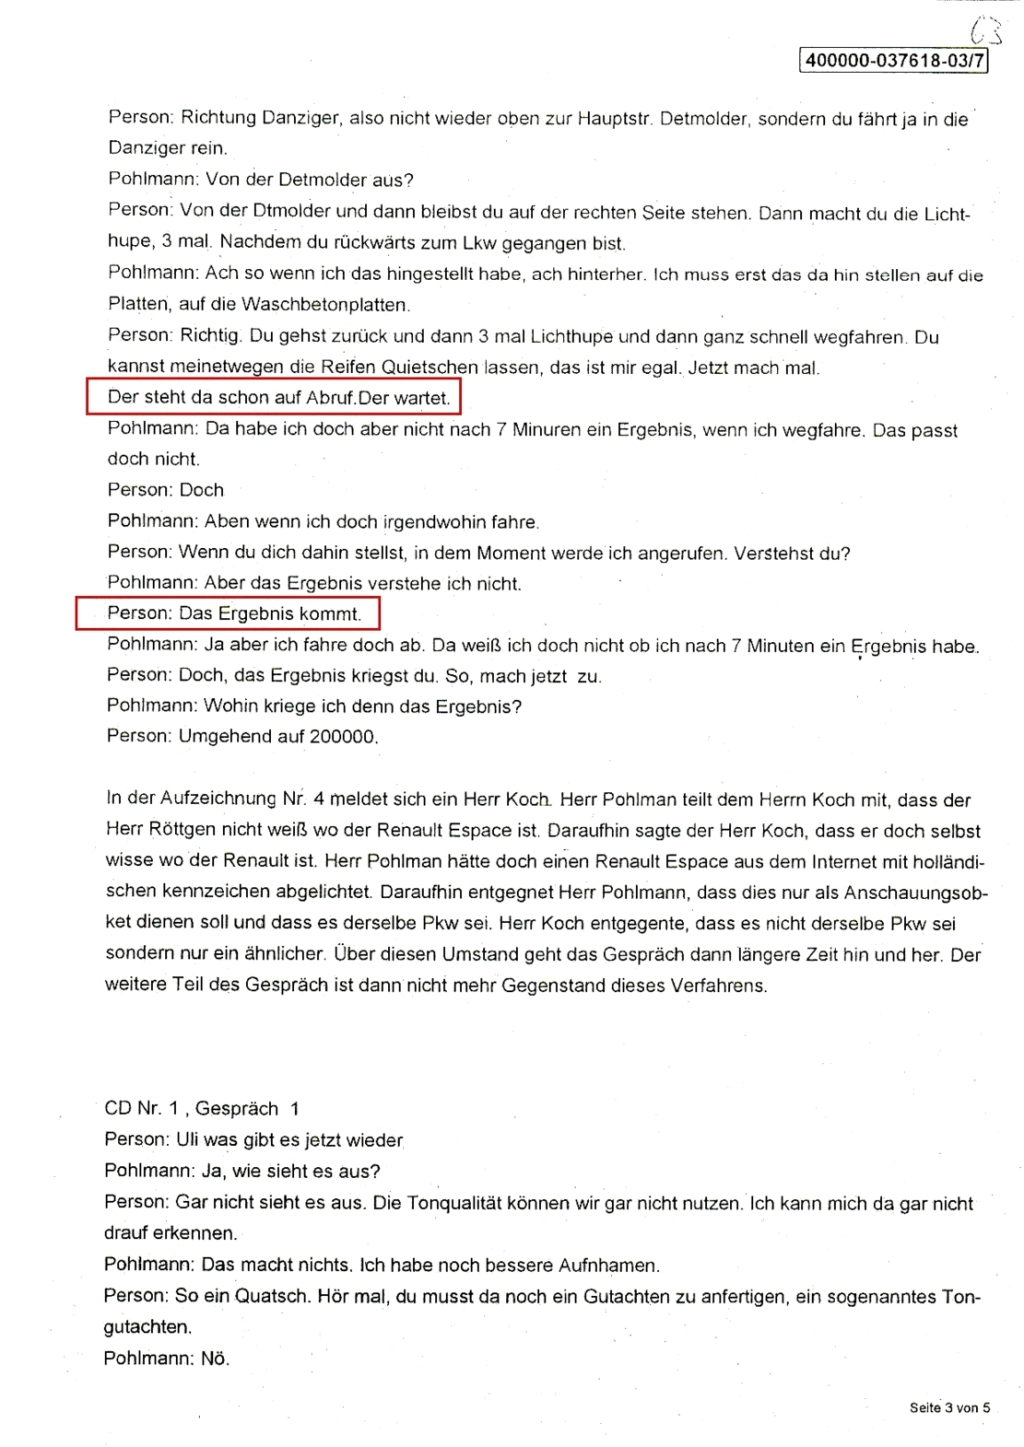 Oeko-Tech-Park-Bandendiebstahl-Erpressung-Meyer-Stork-Windel (2)